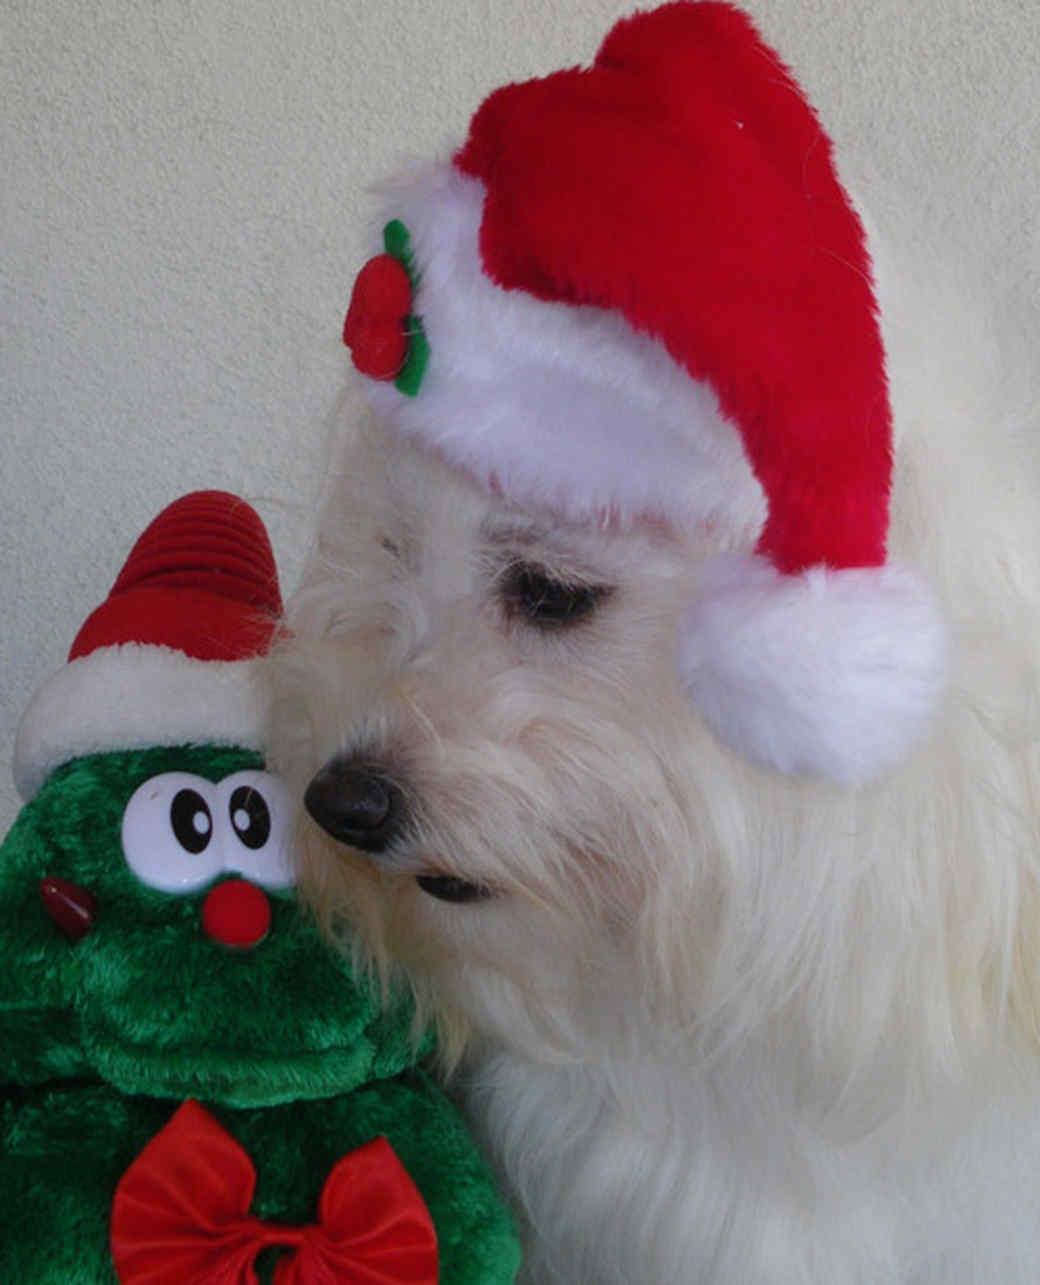 pets_santa09_6833909_14127850_main.jpg